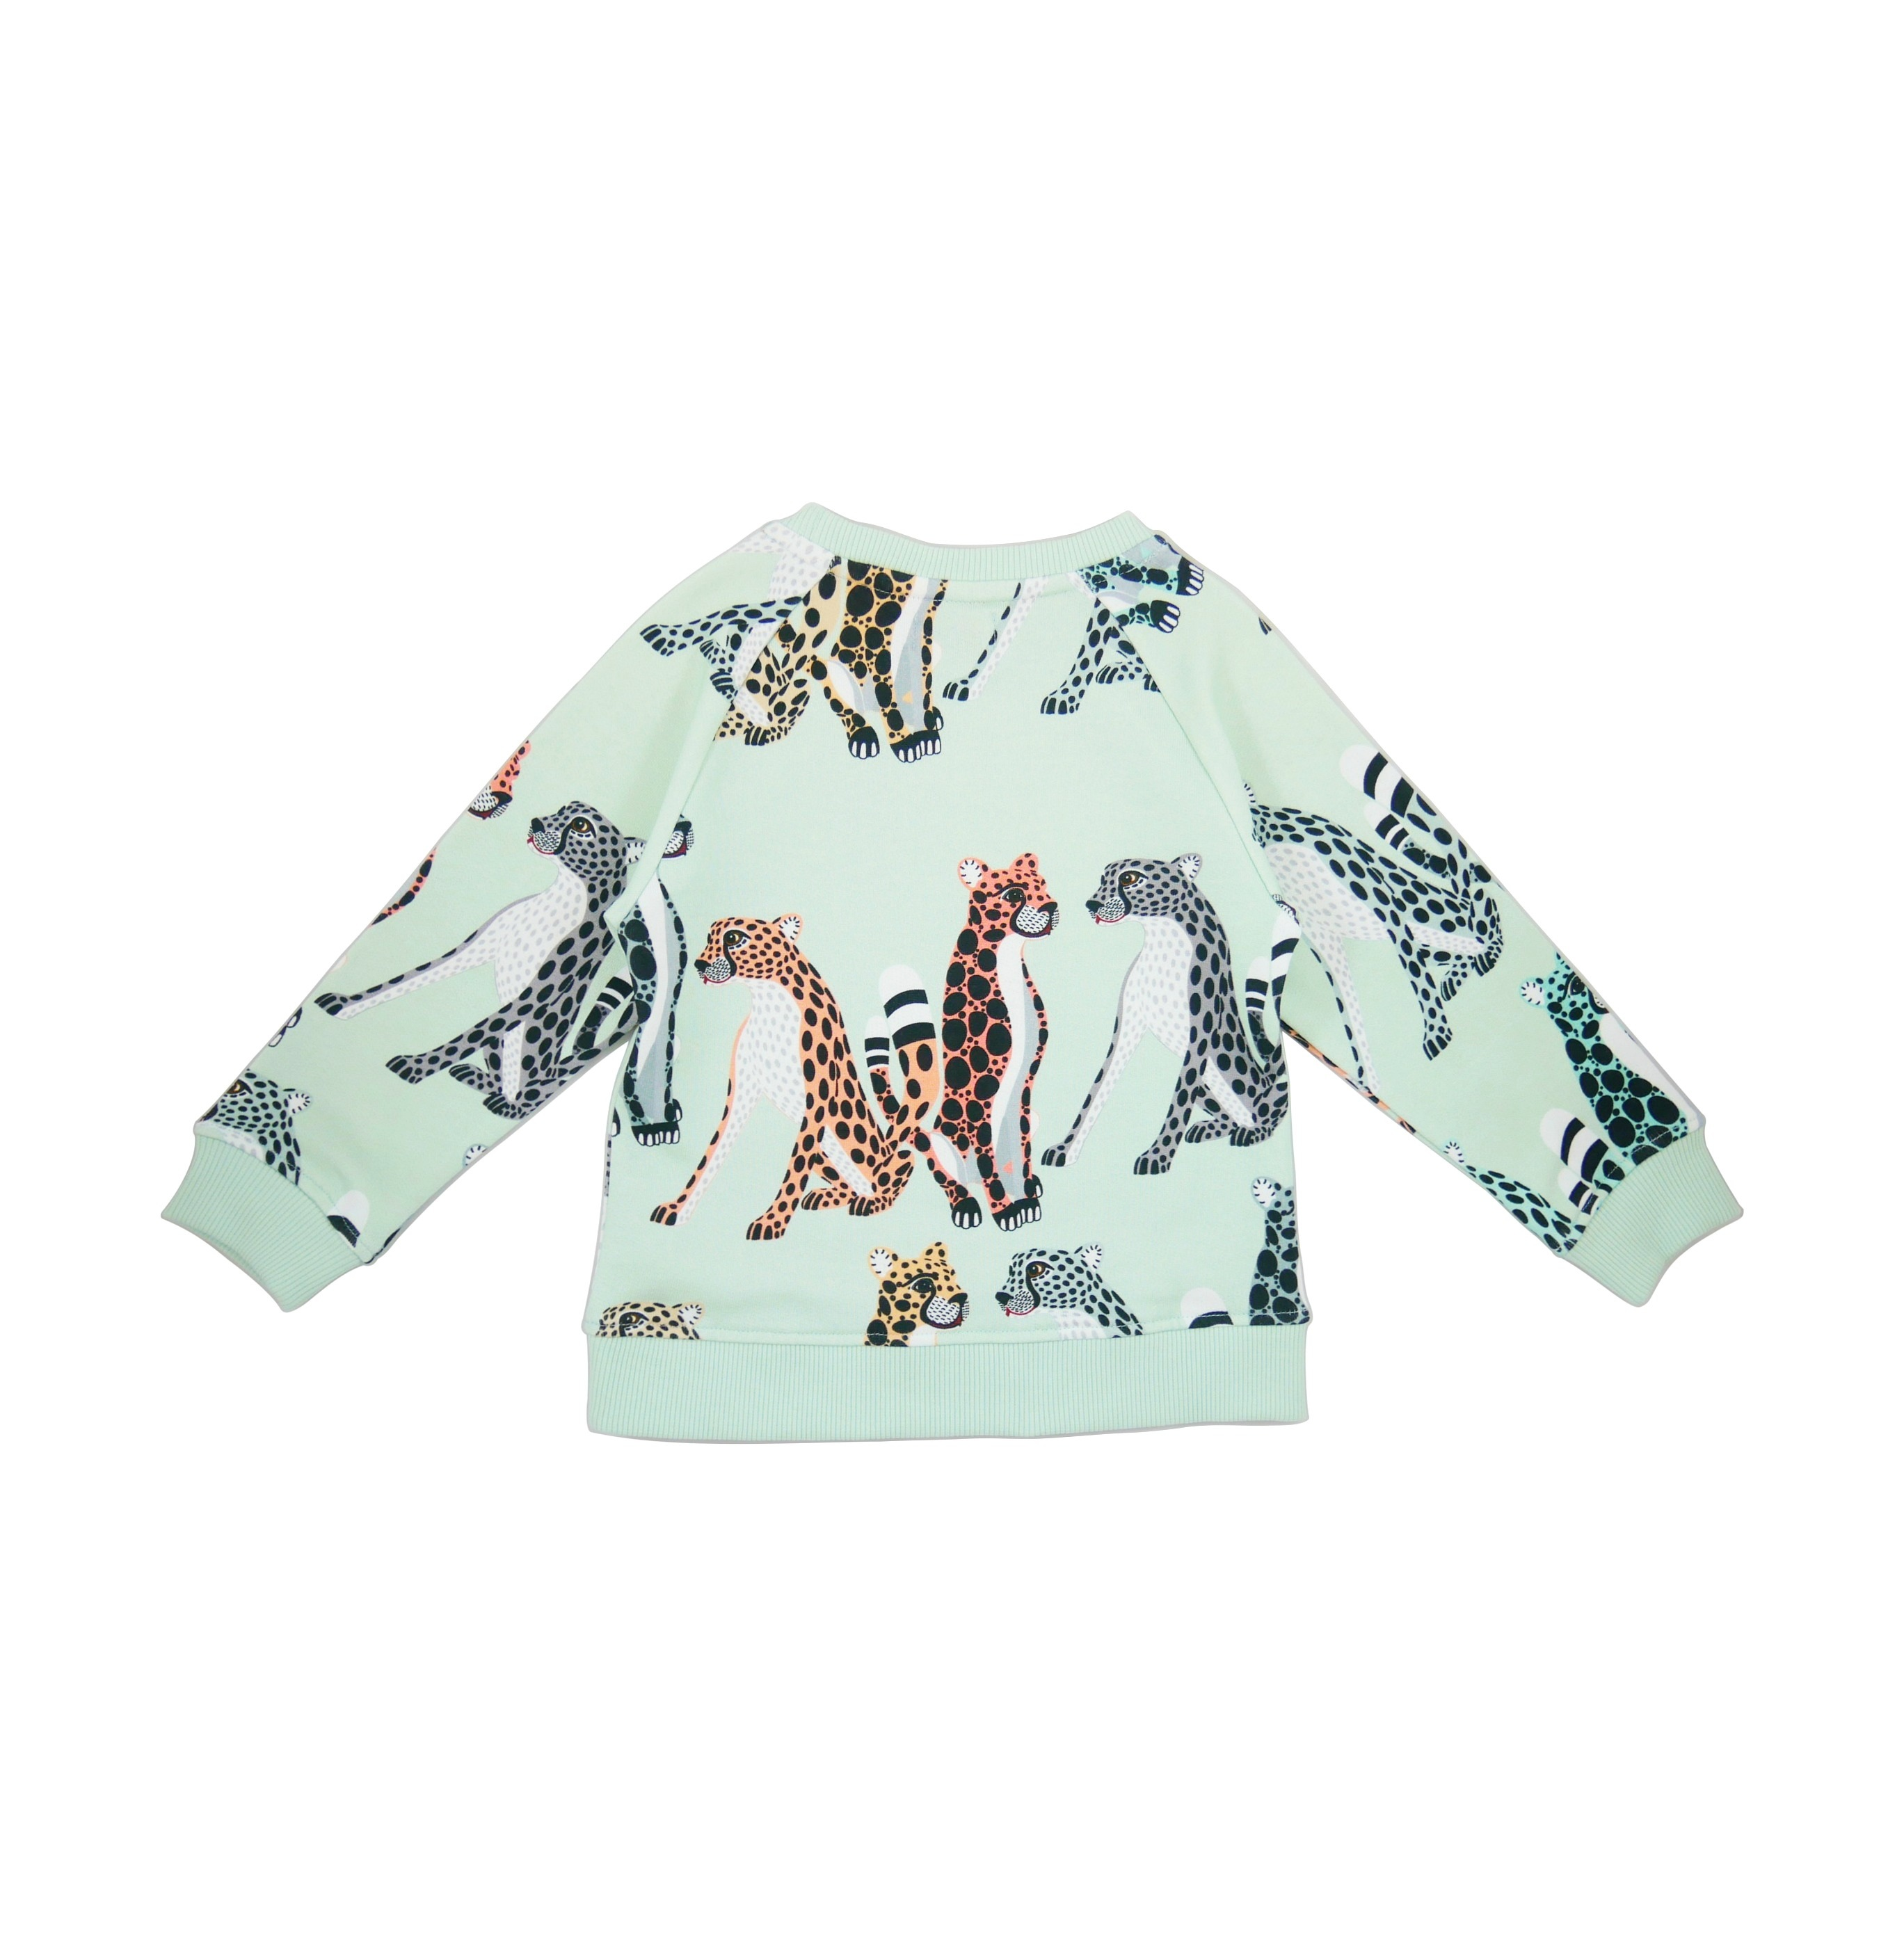 19SSSC Sweatshirt Cheetahs AOP back